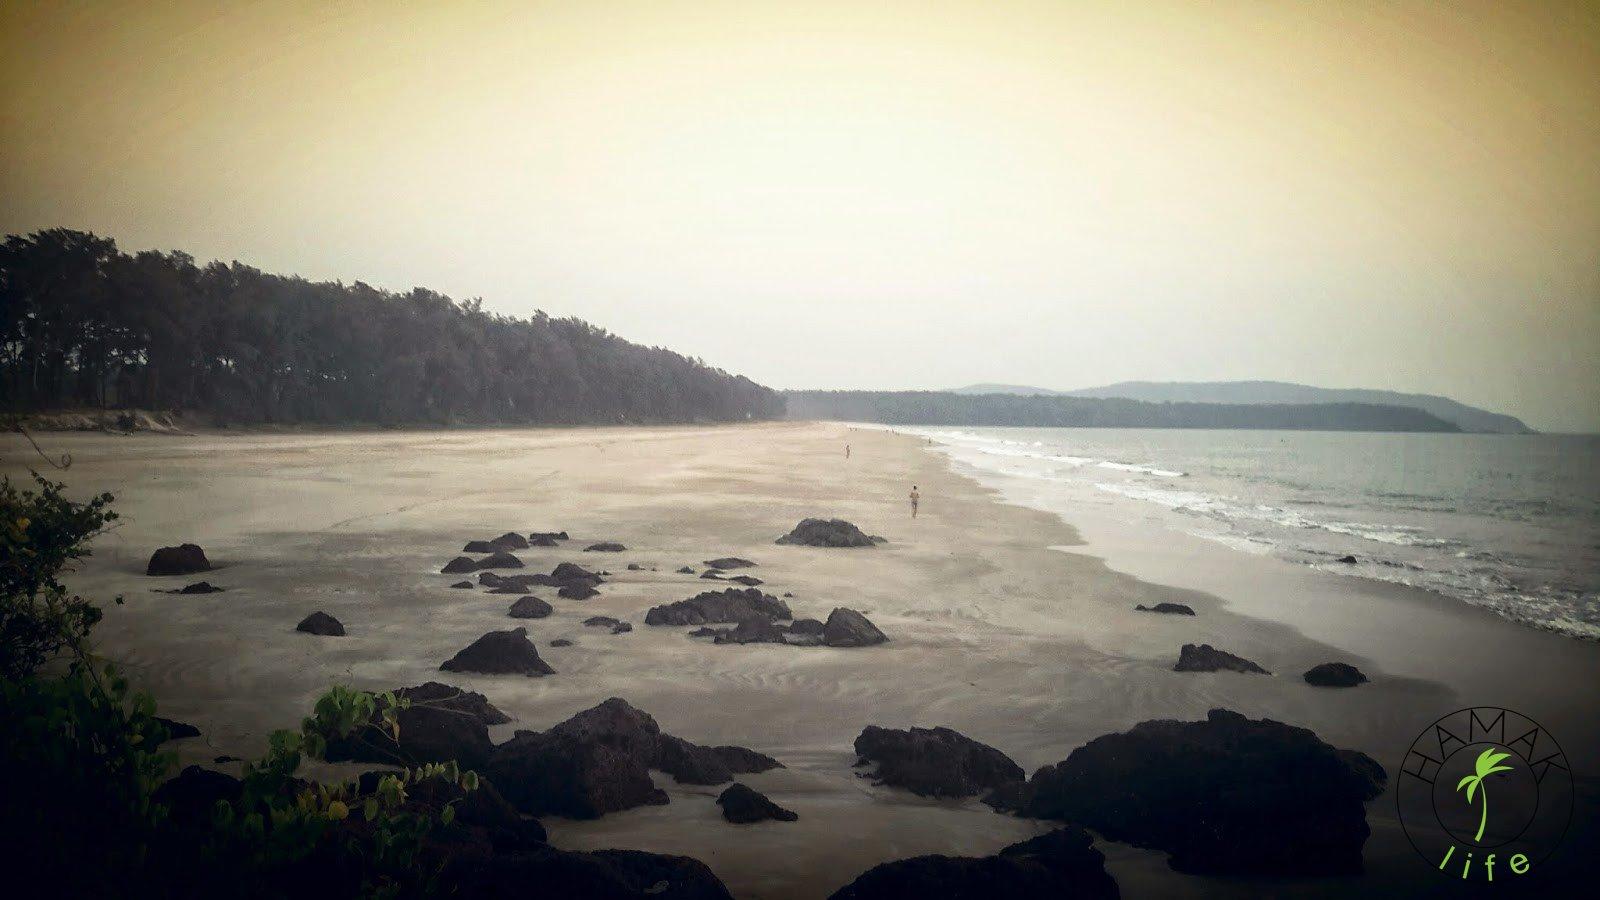 Indie, Goa 2015